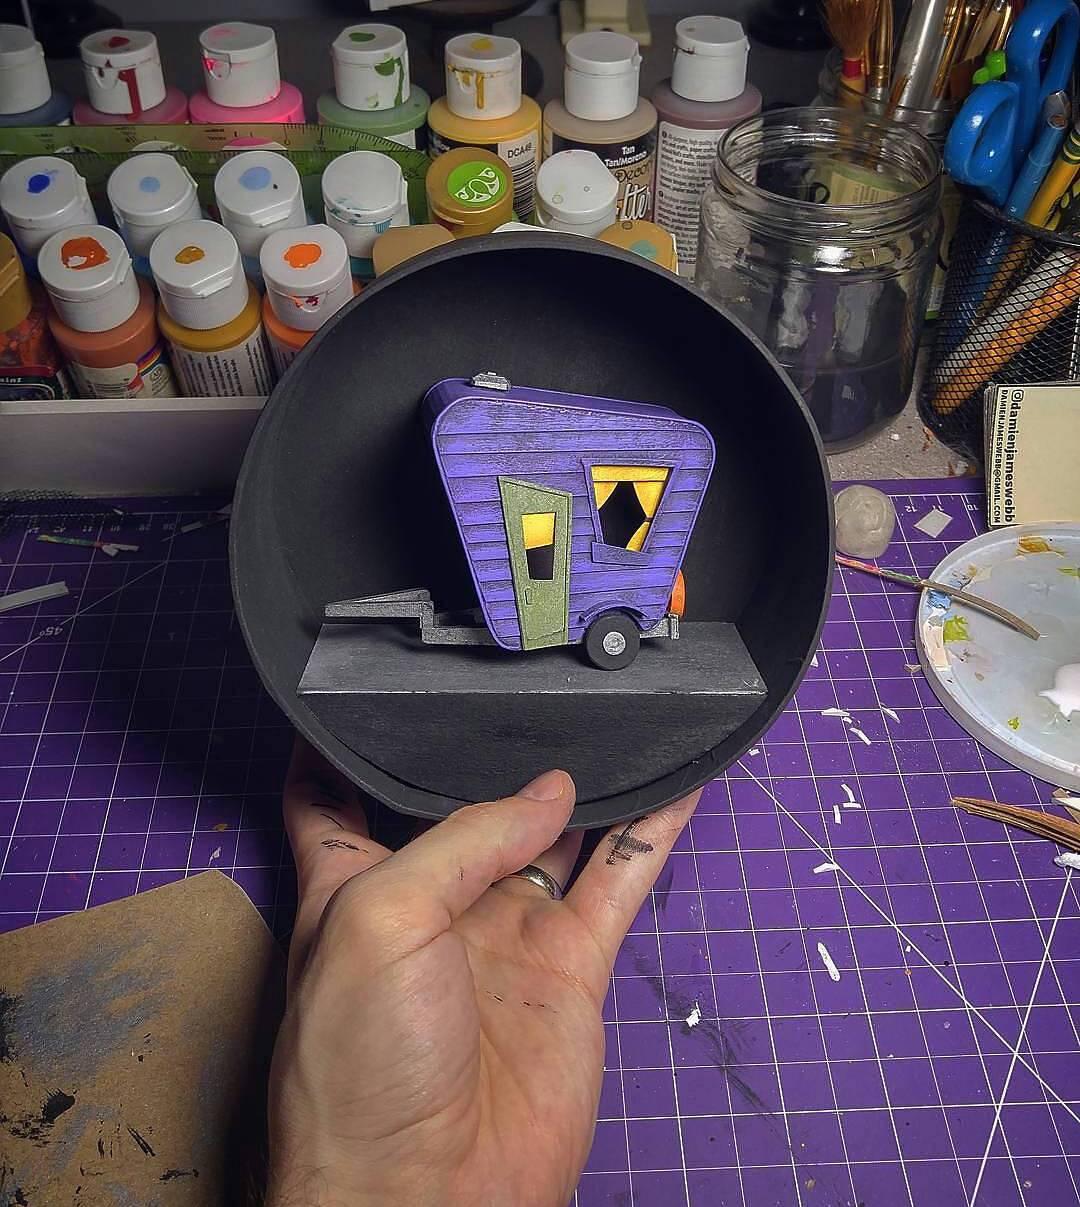 Model Maker Displays A Remarkable Eye For Detail In Making Adorable Miniature Models 8